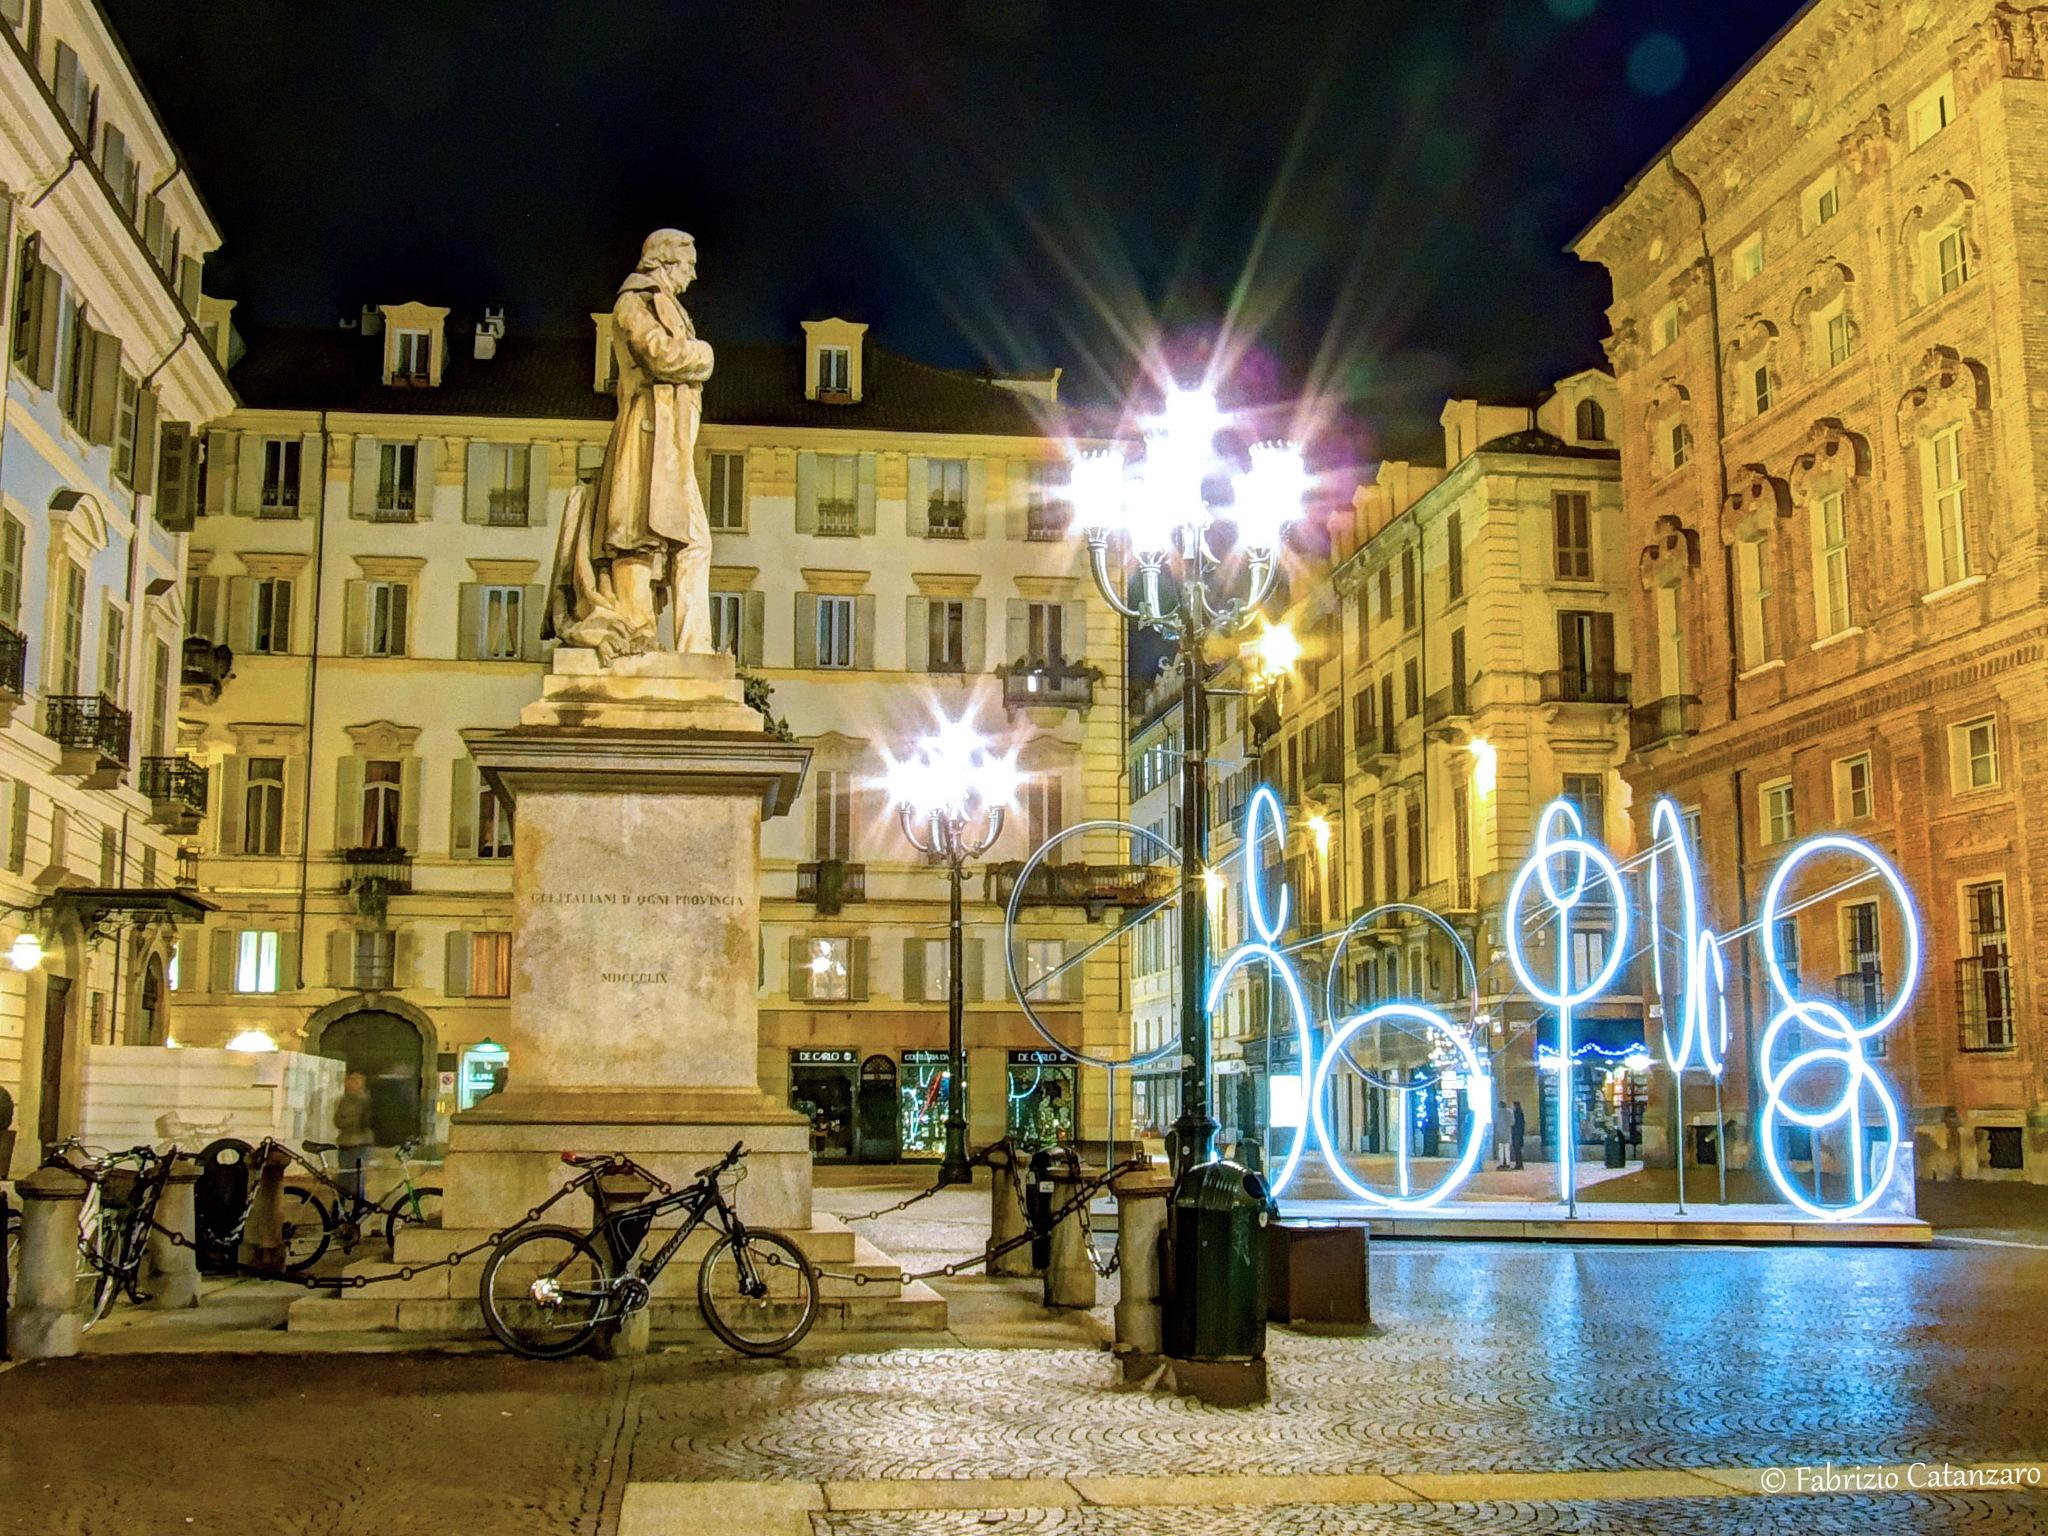 piazza Carignano by fabricata